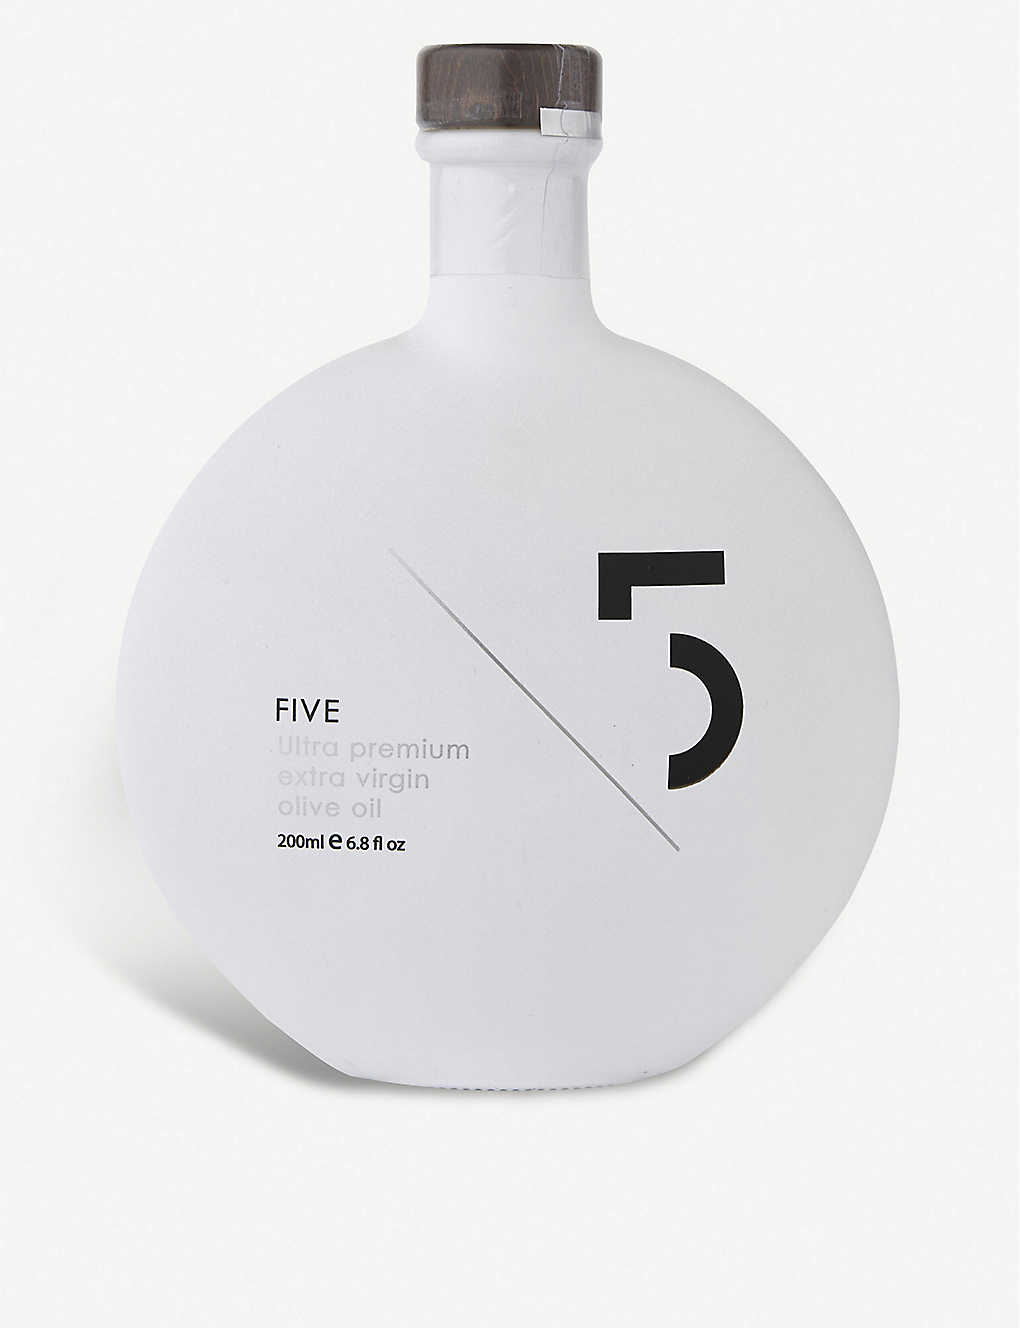 5ive ultra premium extra-virgin olive oil 200ml